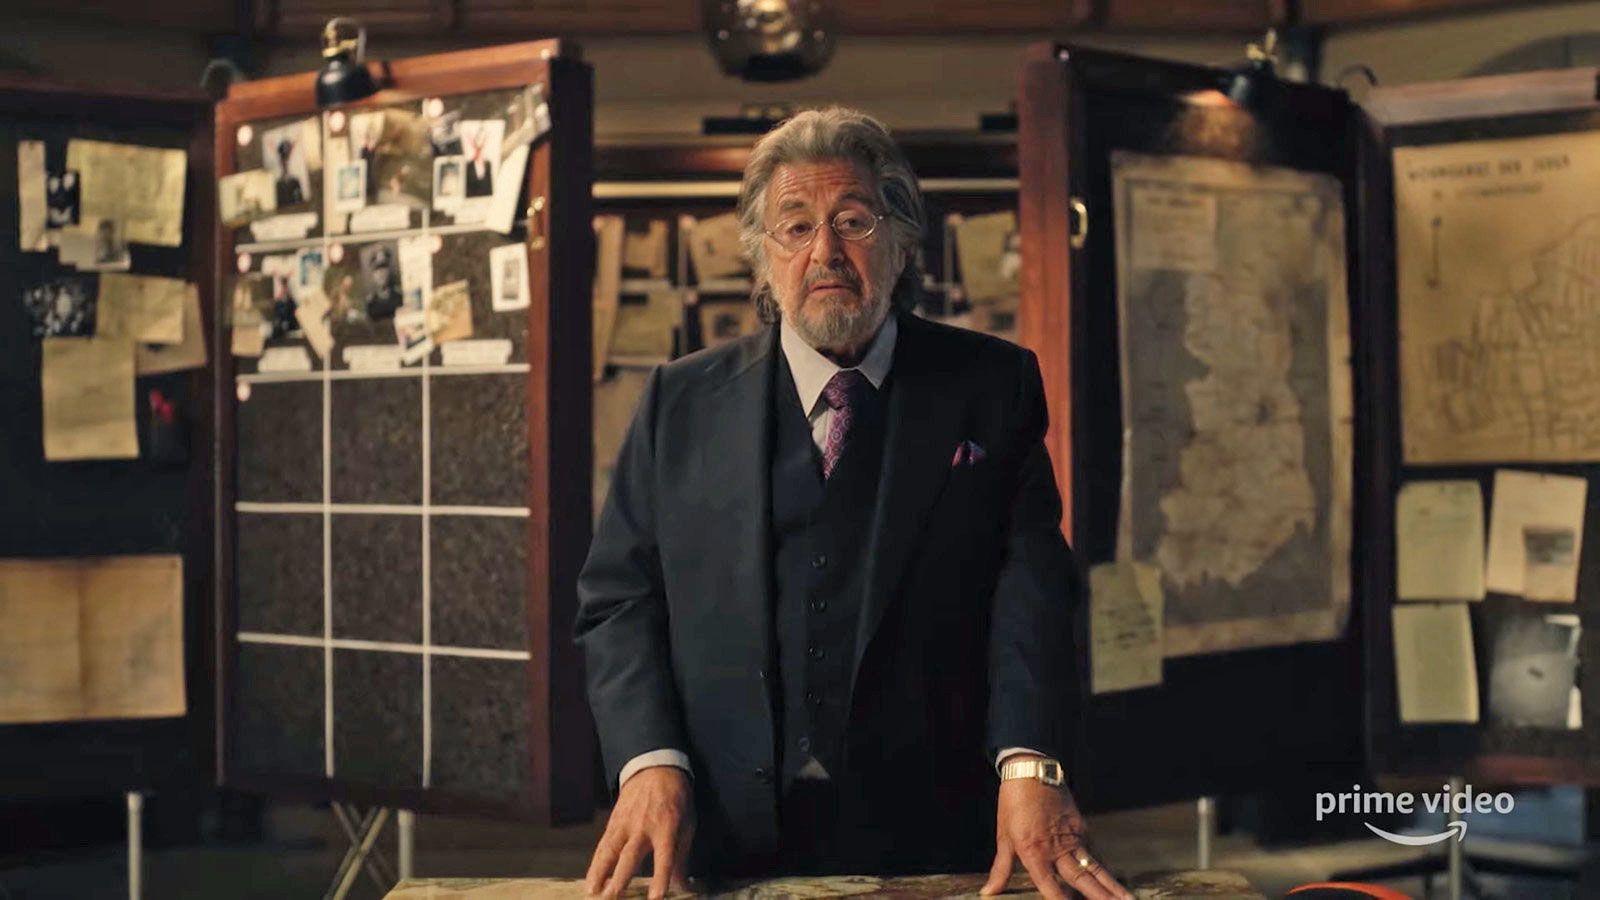 Is Amazon's Al Pacino And Jordan Peele Drama 'Hunters' A True Story?